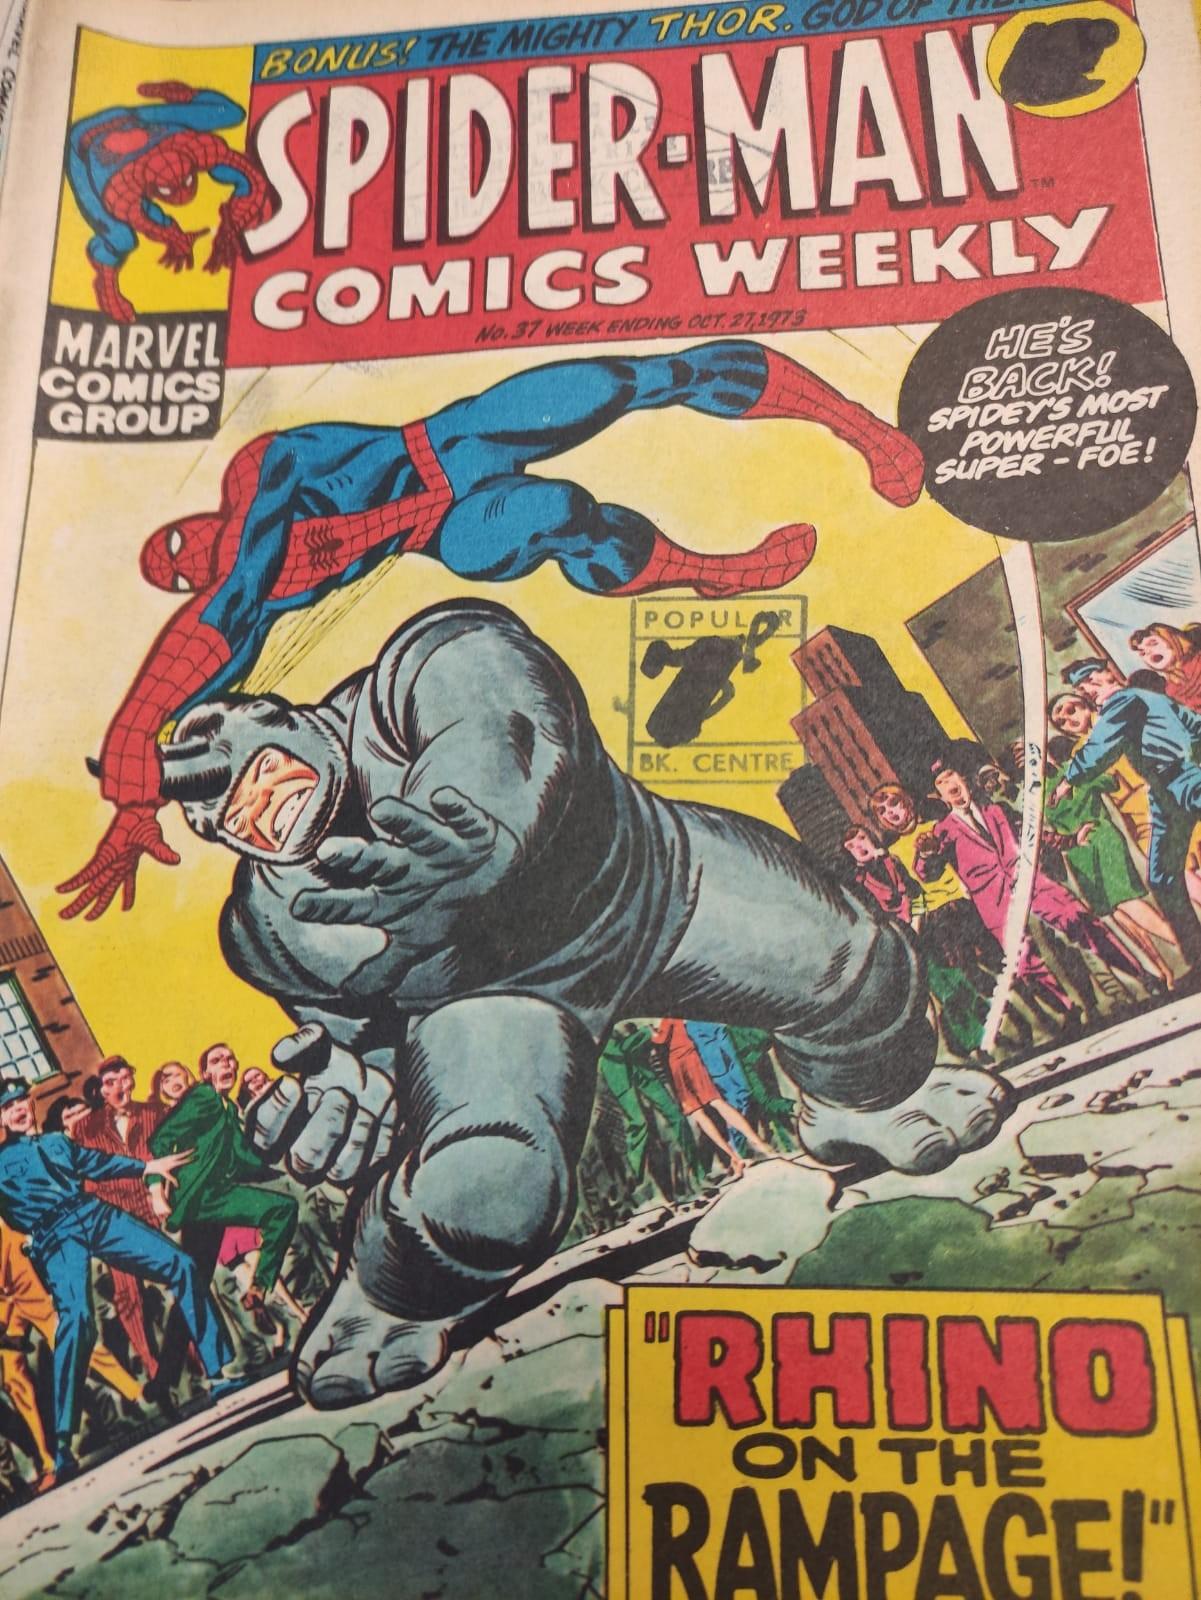 6 x Marvel comics. 1973 Spider-Man comics weekly. - Image 12 of 13